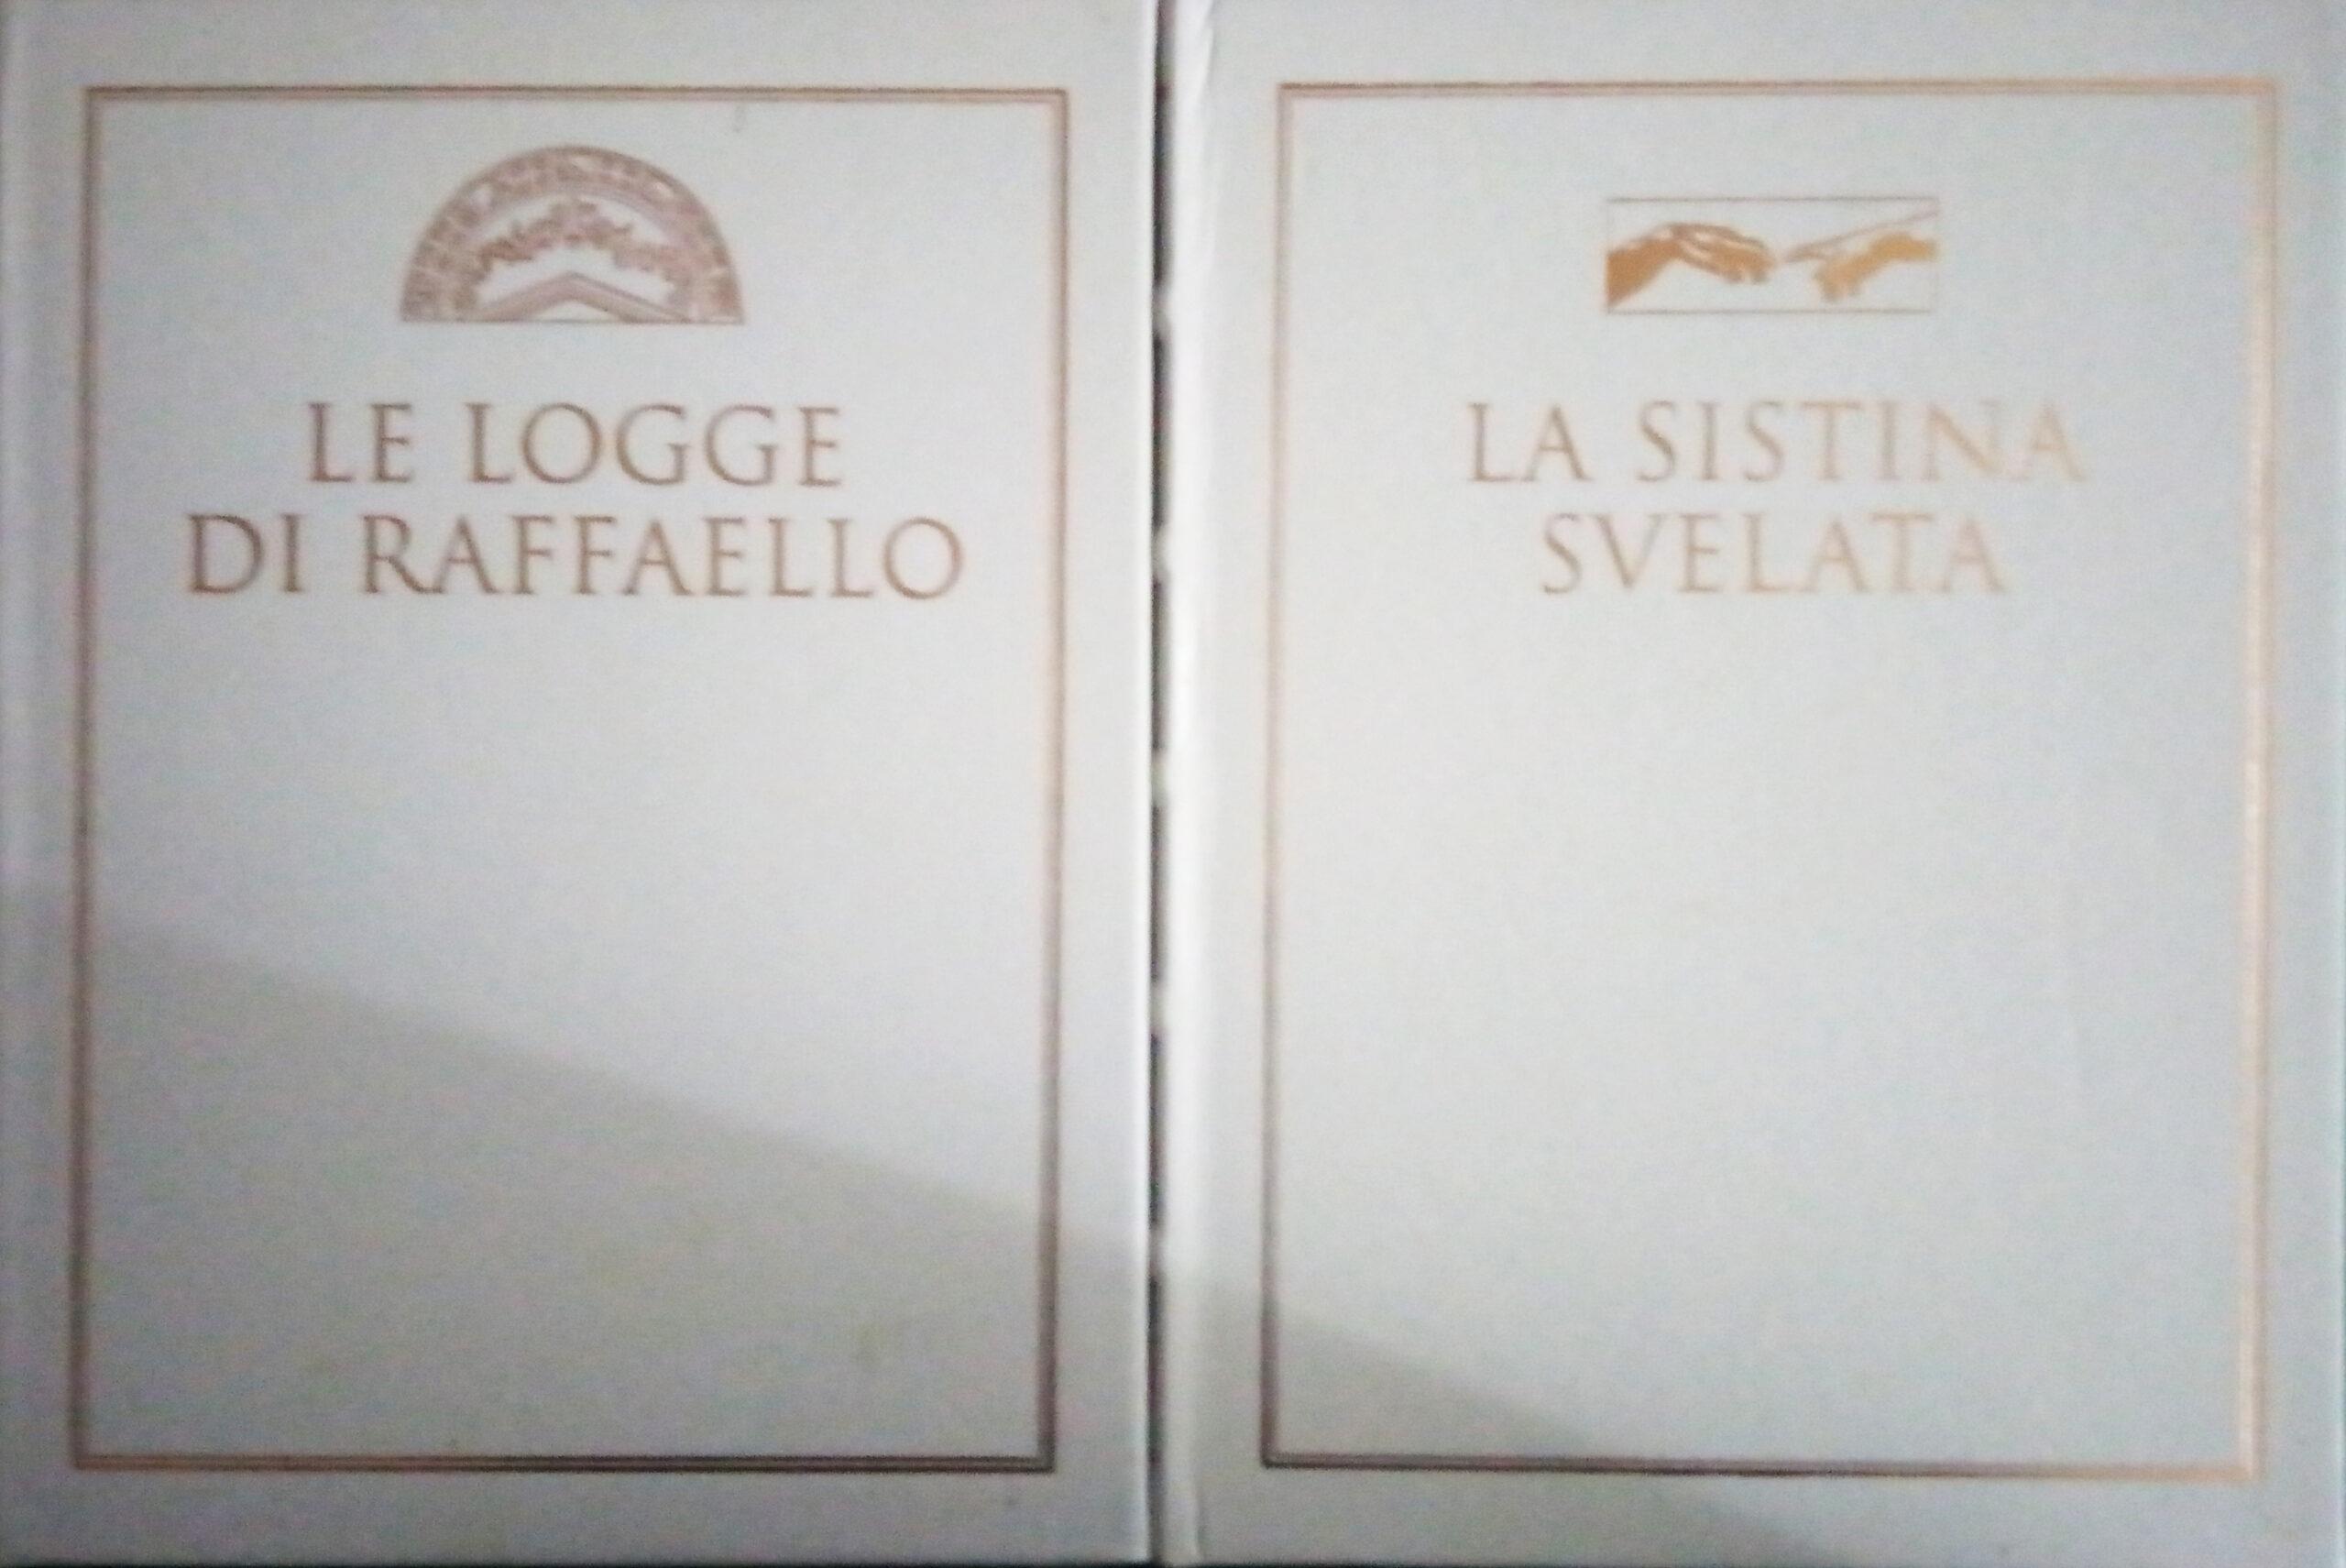 Raffaello e Sistina – Libreria Vaticana